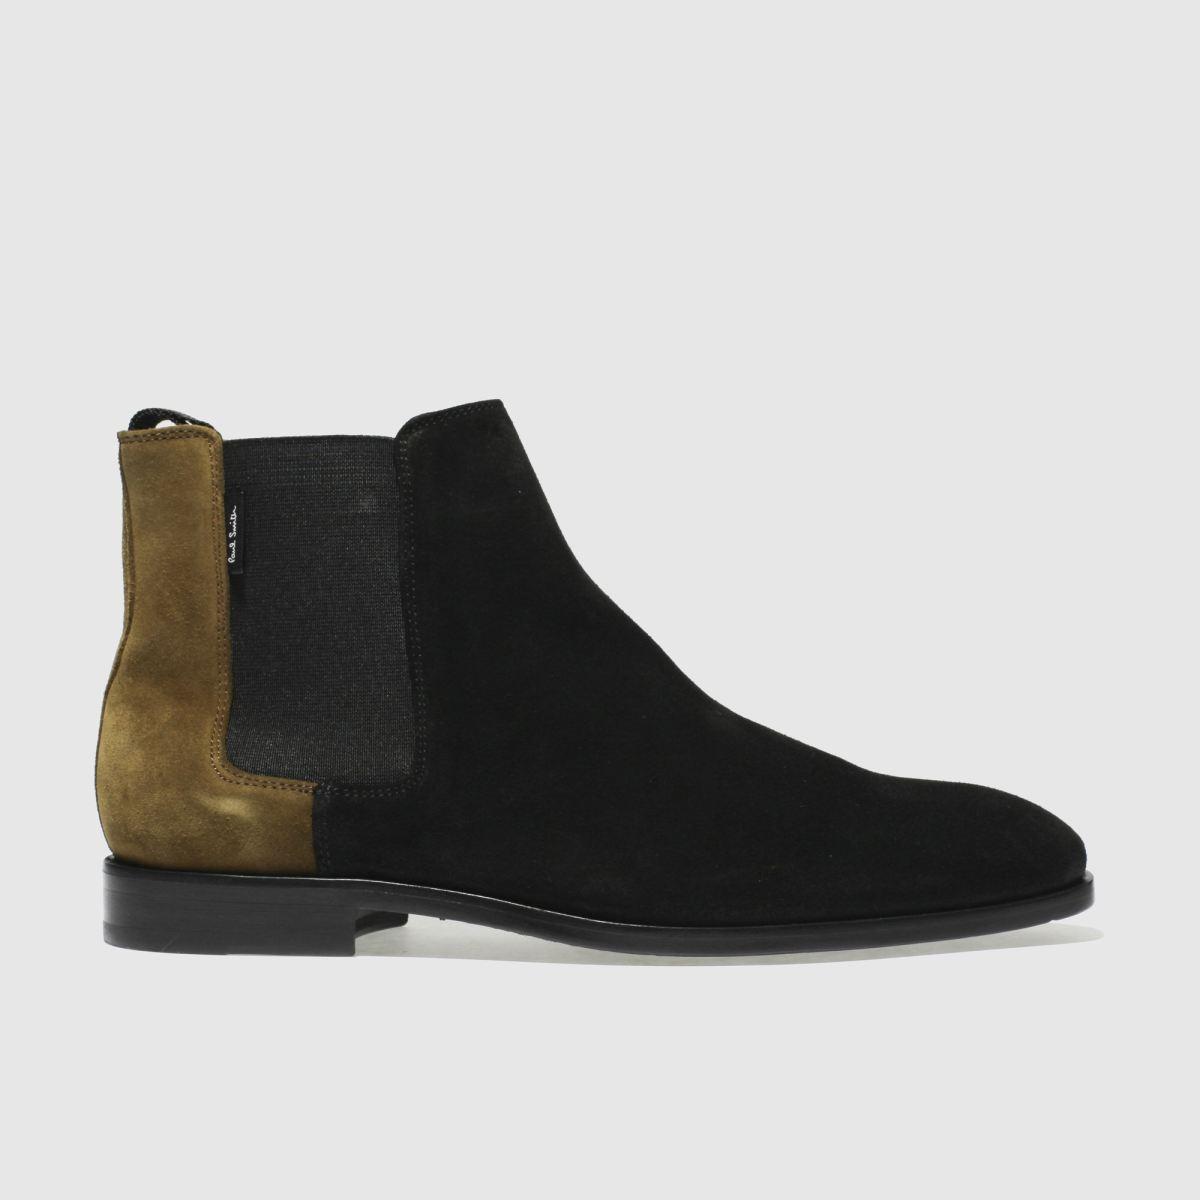 paul smith shoe ps Paul Smith Shoe Ps Black & Brown Gerald Boots